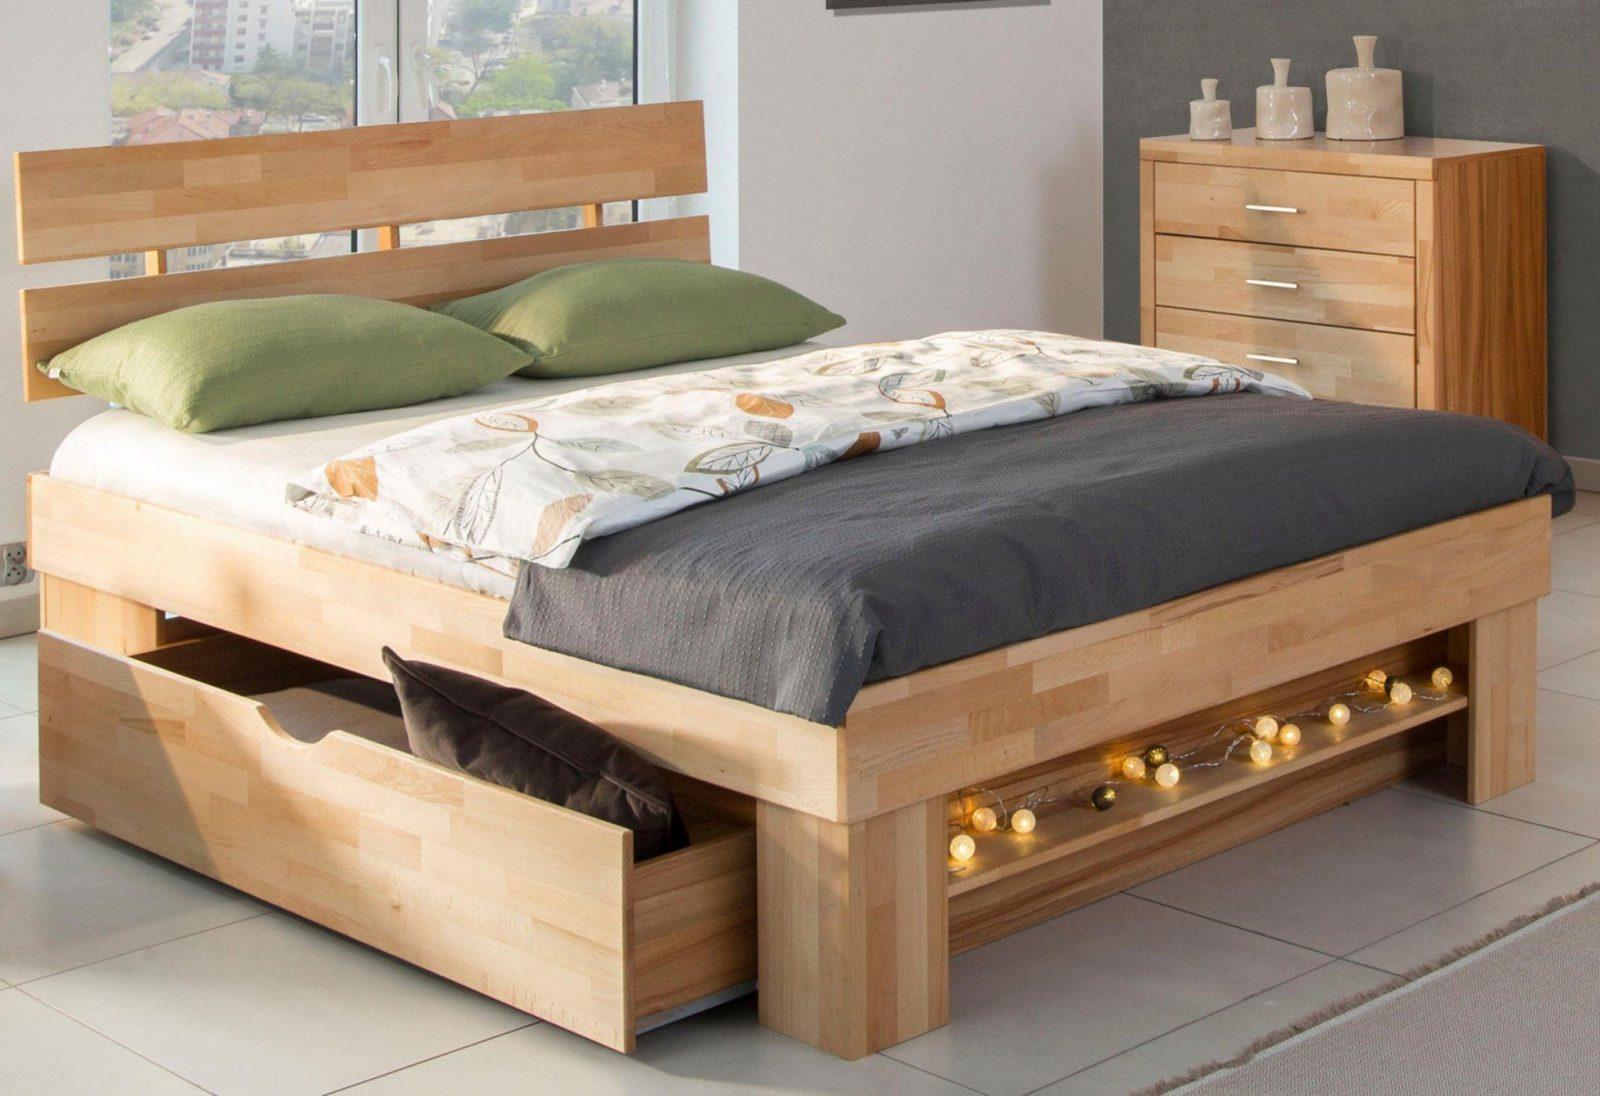 Bett Mit Stufen Selber Bauen Perfekt Kura Bett Umbaufhig Ikea Fr von Bett Mit Stufen Selber Bauen Photo